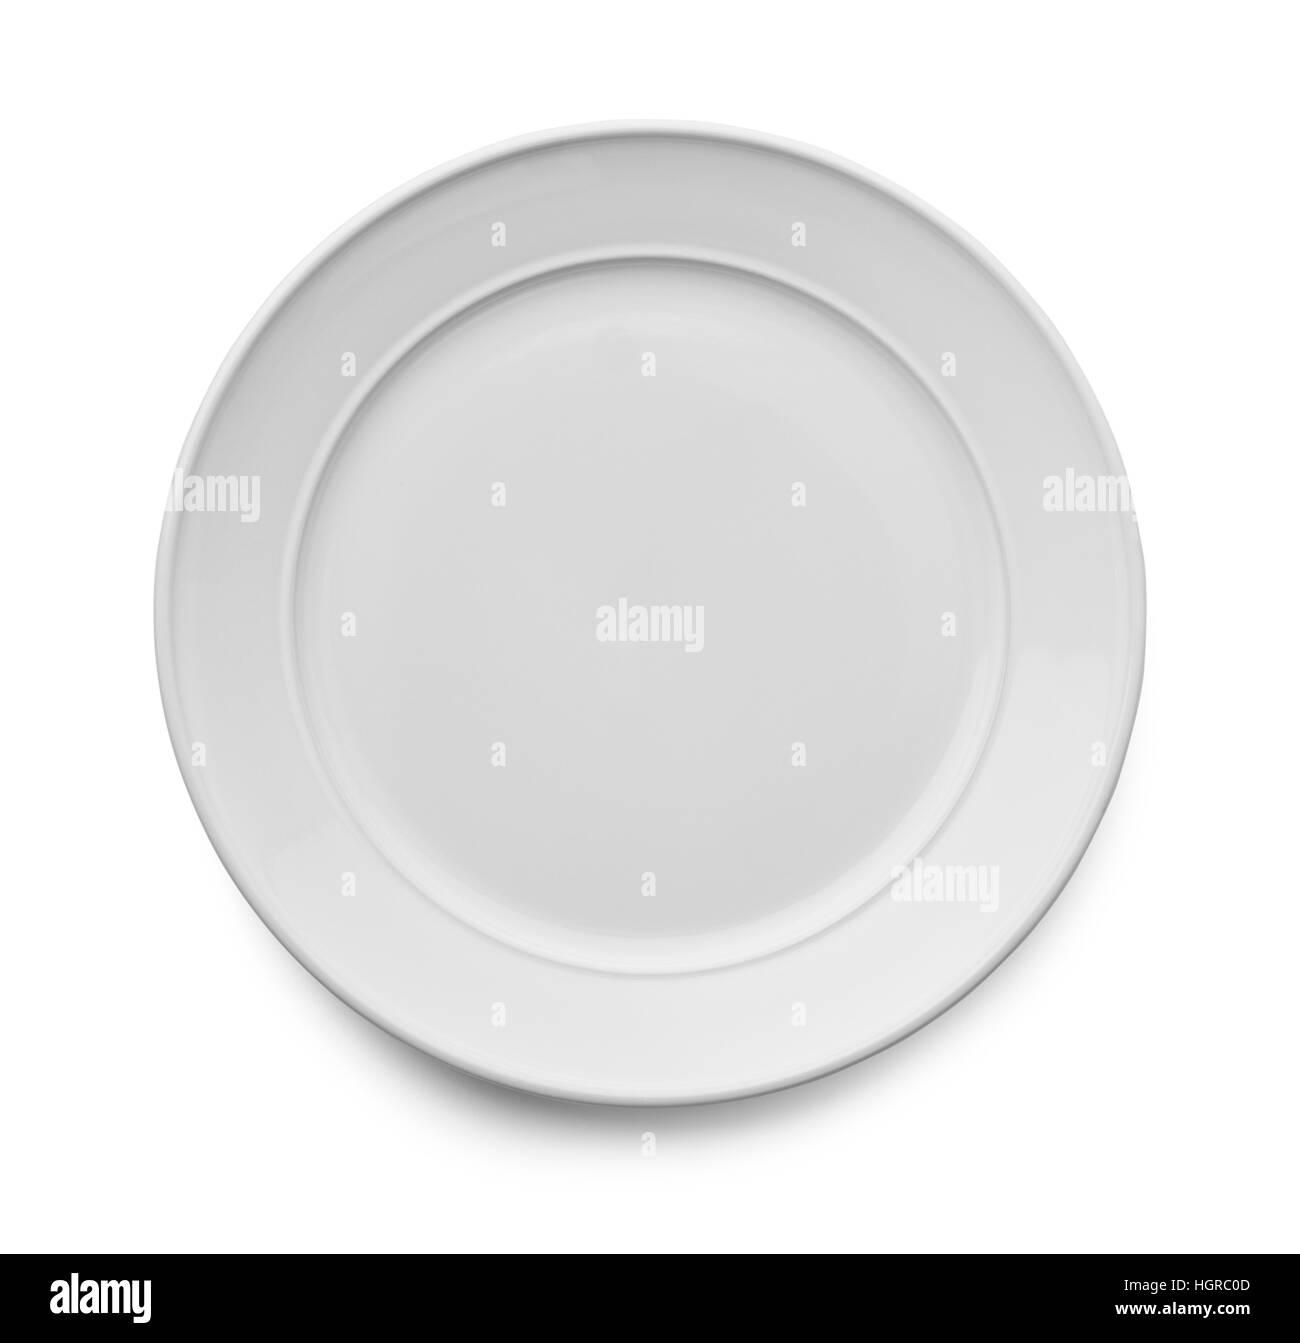 Blank White Ceramic Plate Isolated on White Background. - Stock Image